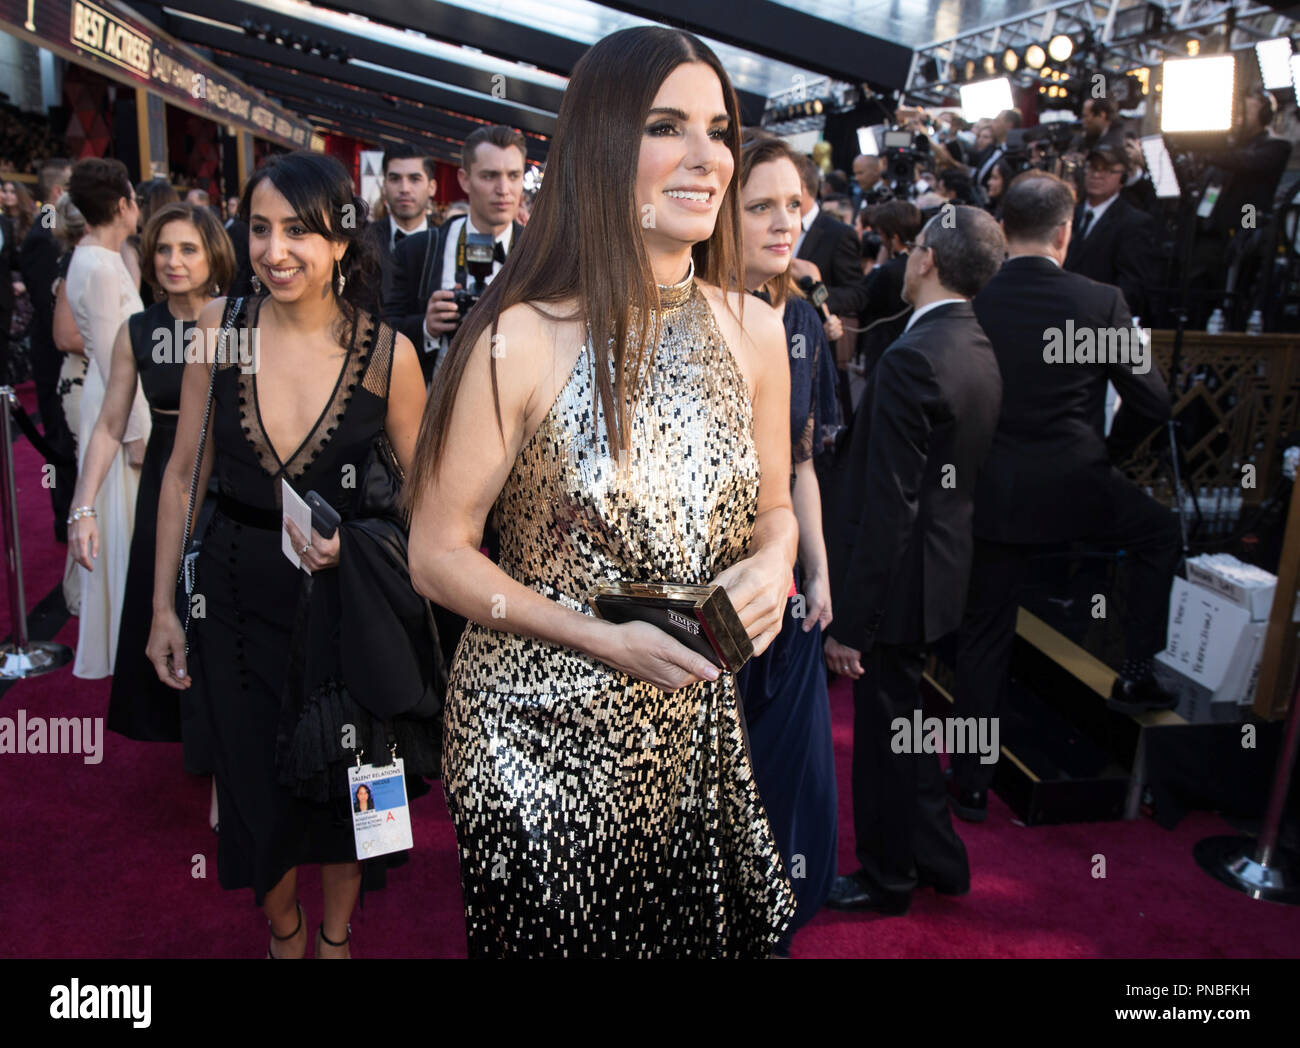 Sandra Bullock arrives on the red carpet of The 90th Oscars